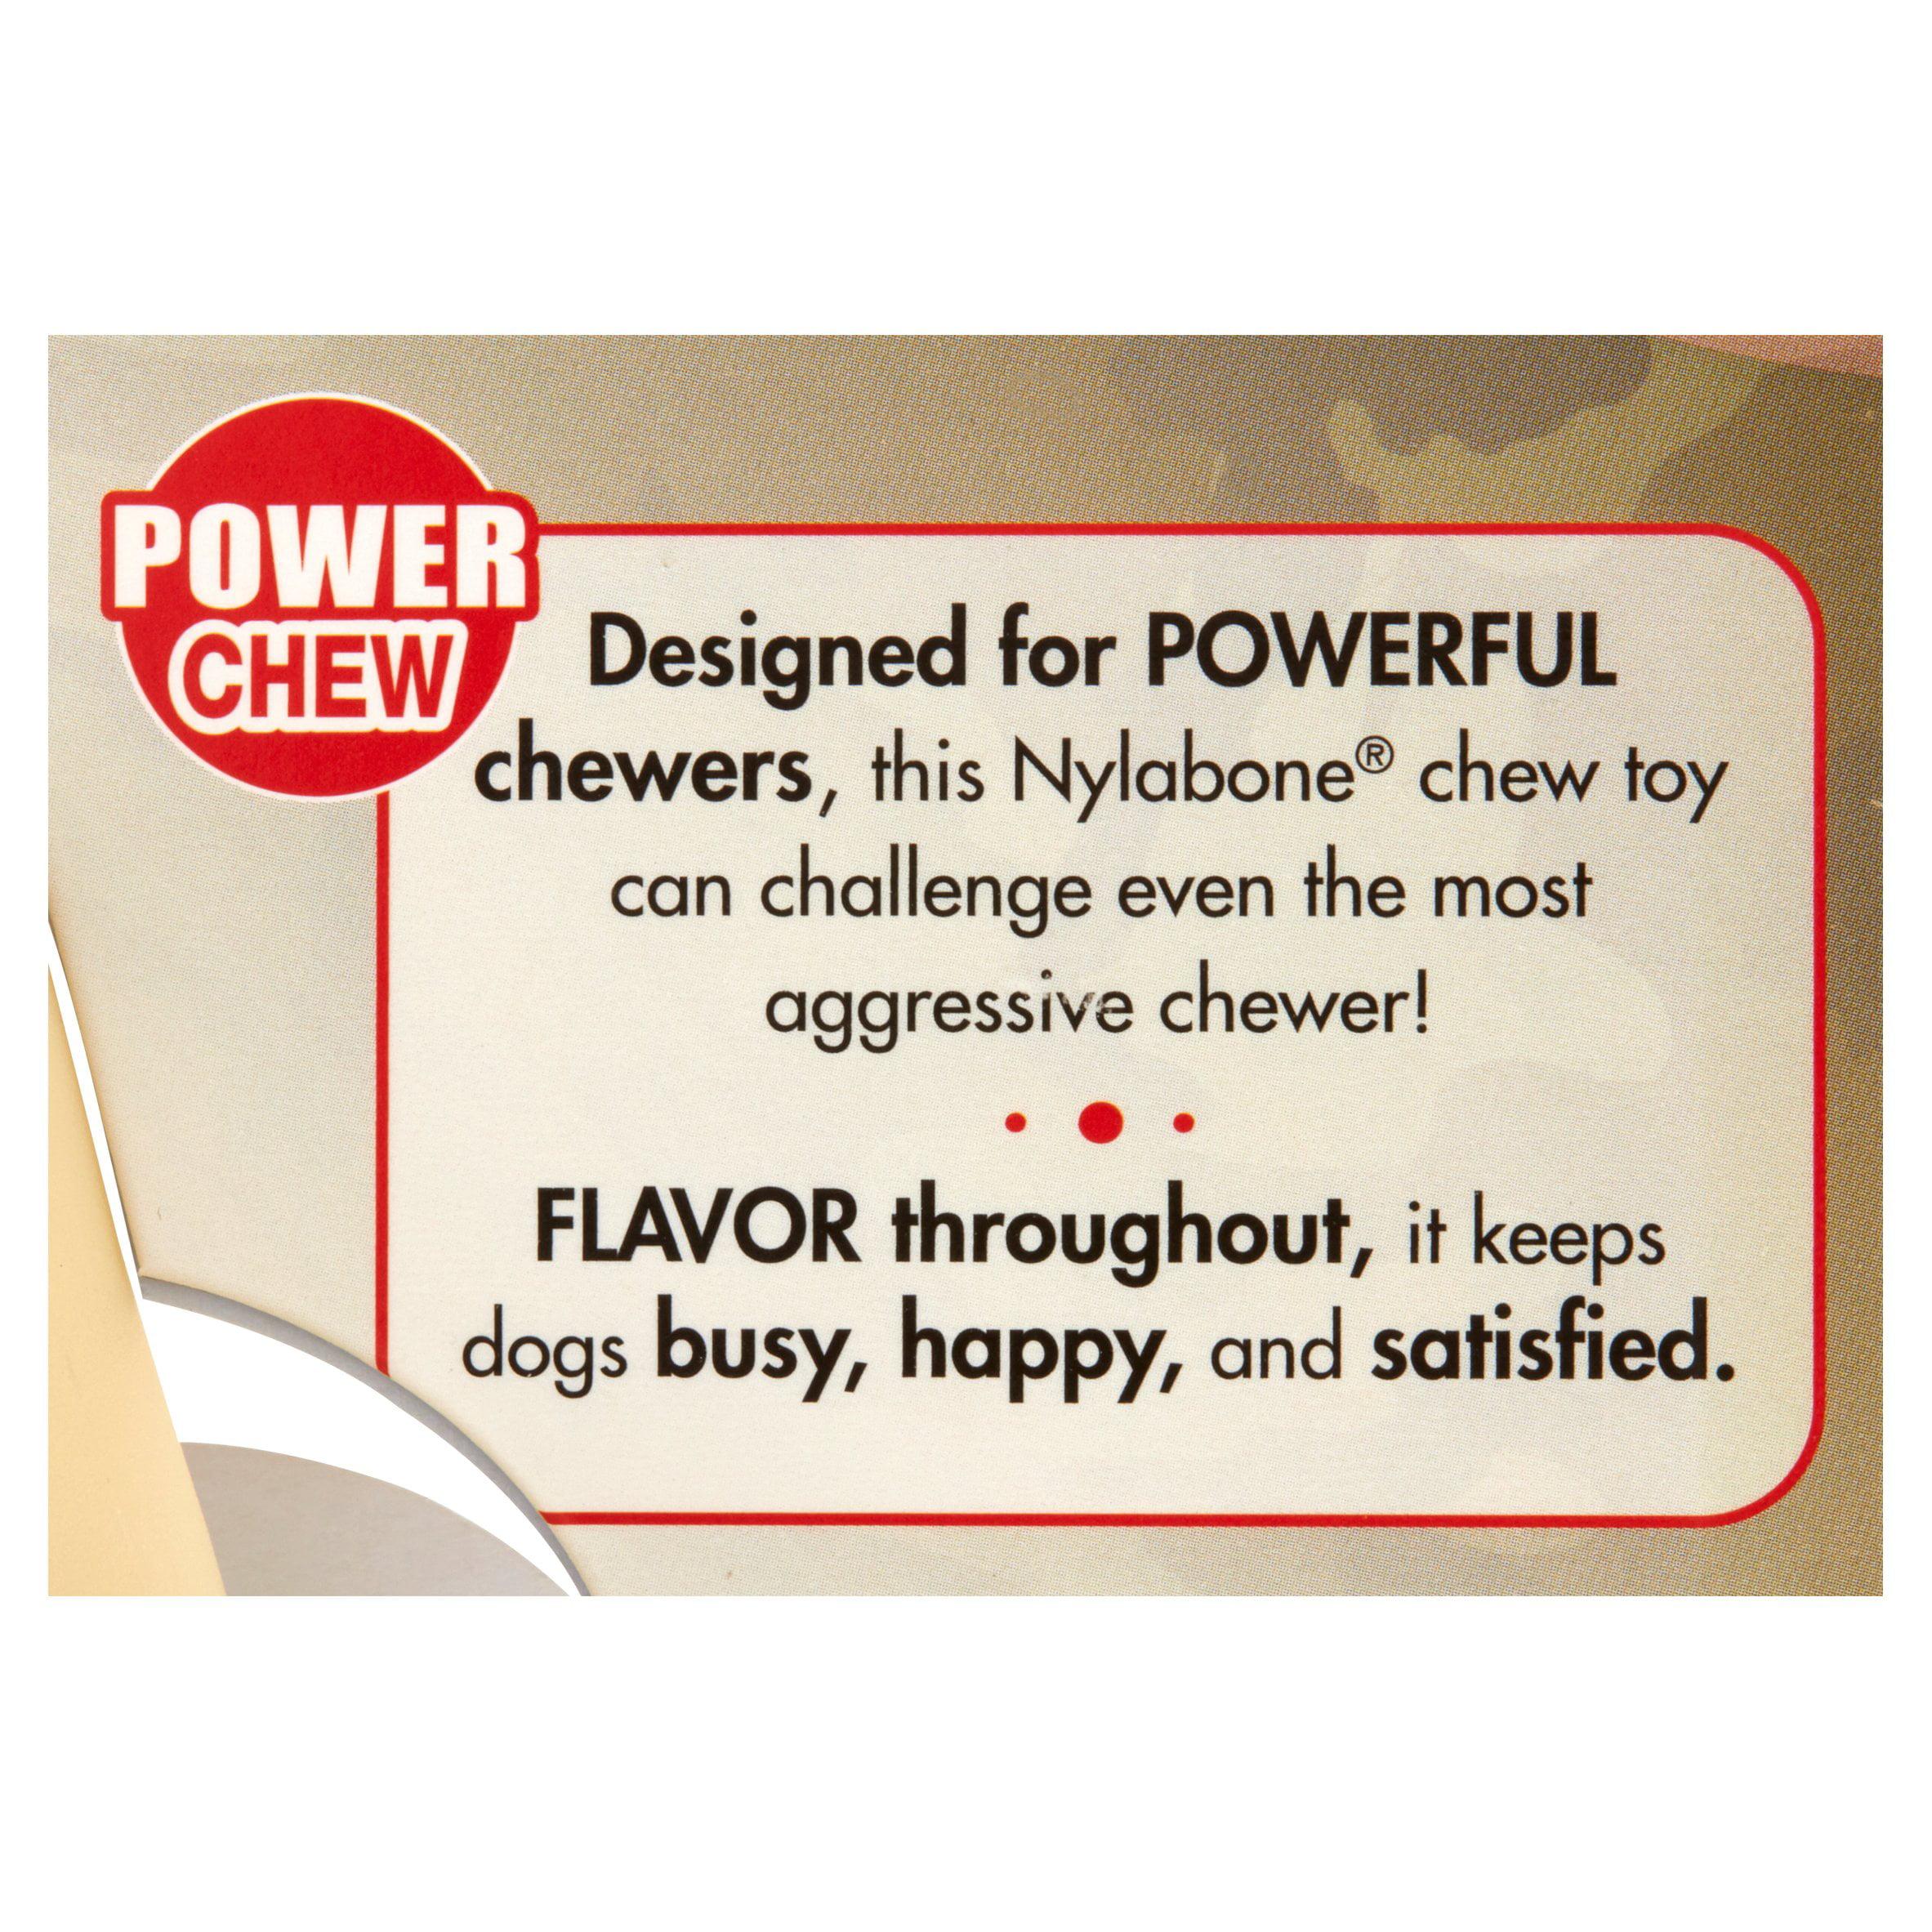 Juguete Para Perros Nylabone Power Chew Rawhide Roll Dog Toy, Chicken Flavor, X-Large + Nylabone en VeoyCompro.net